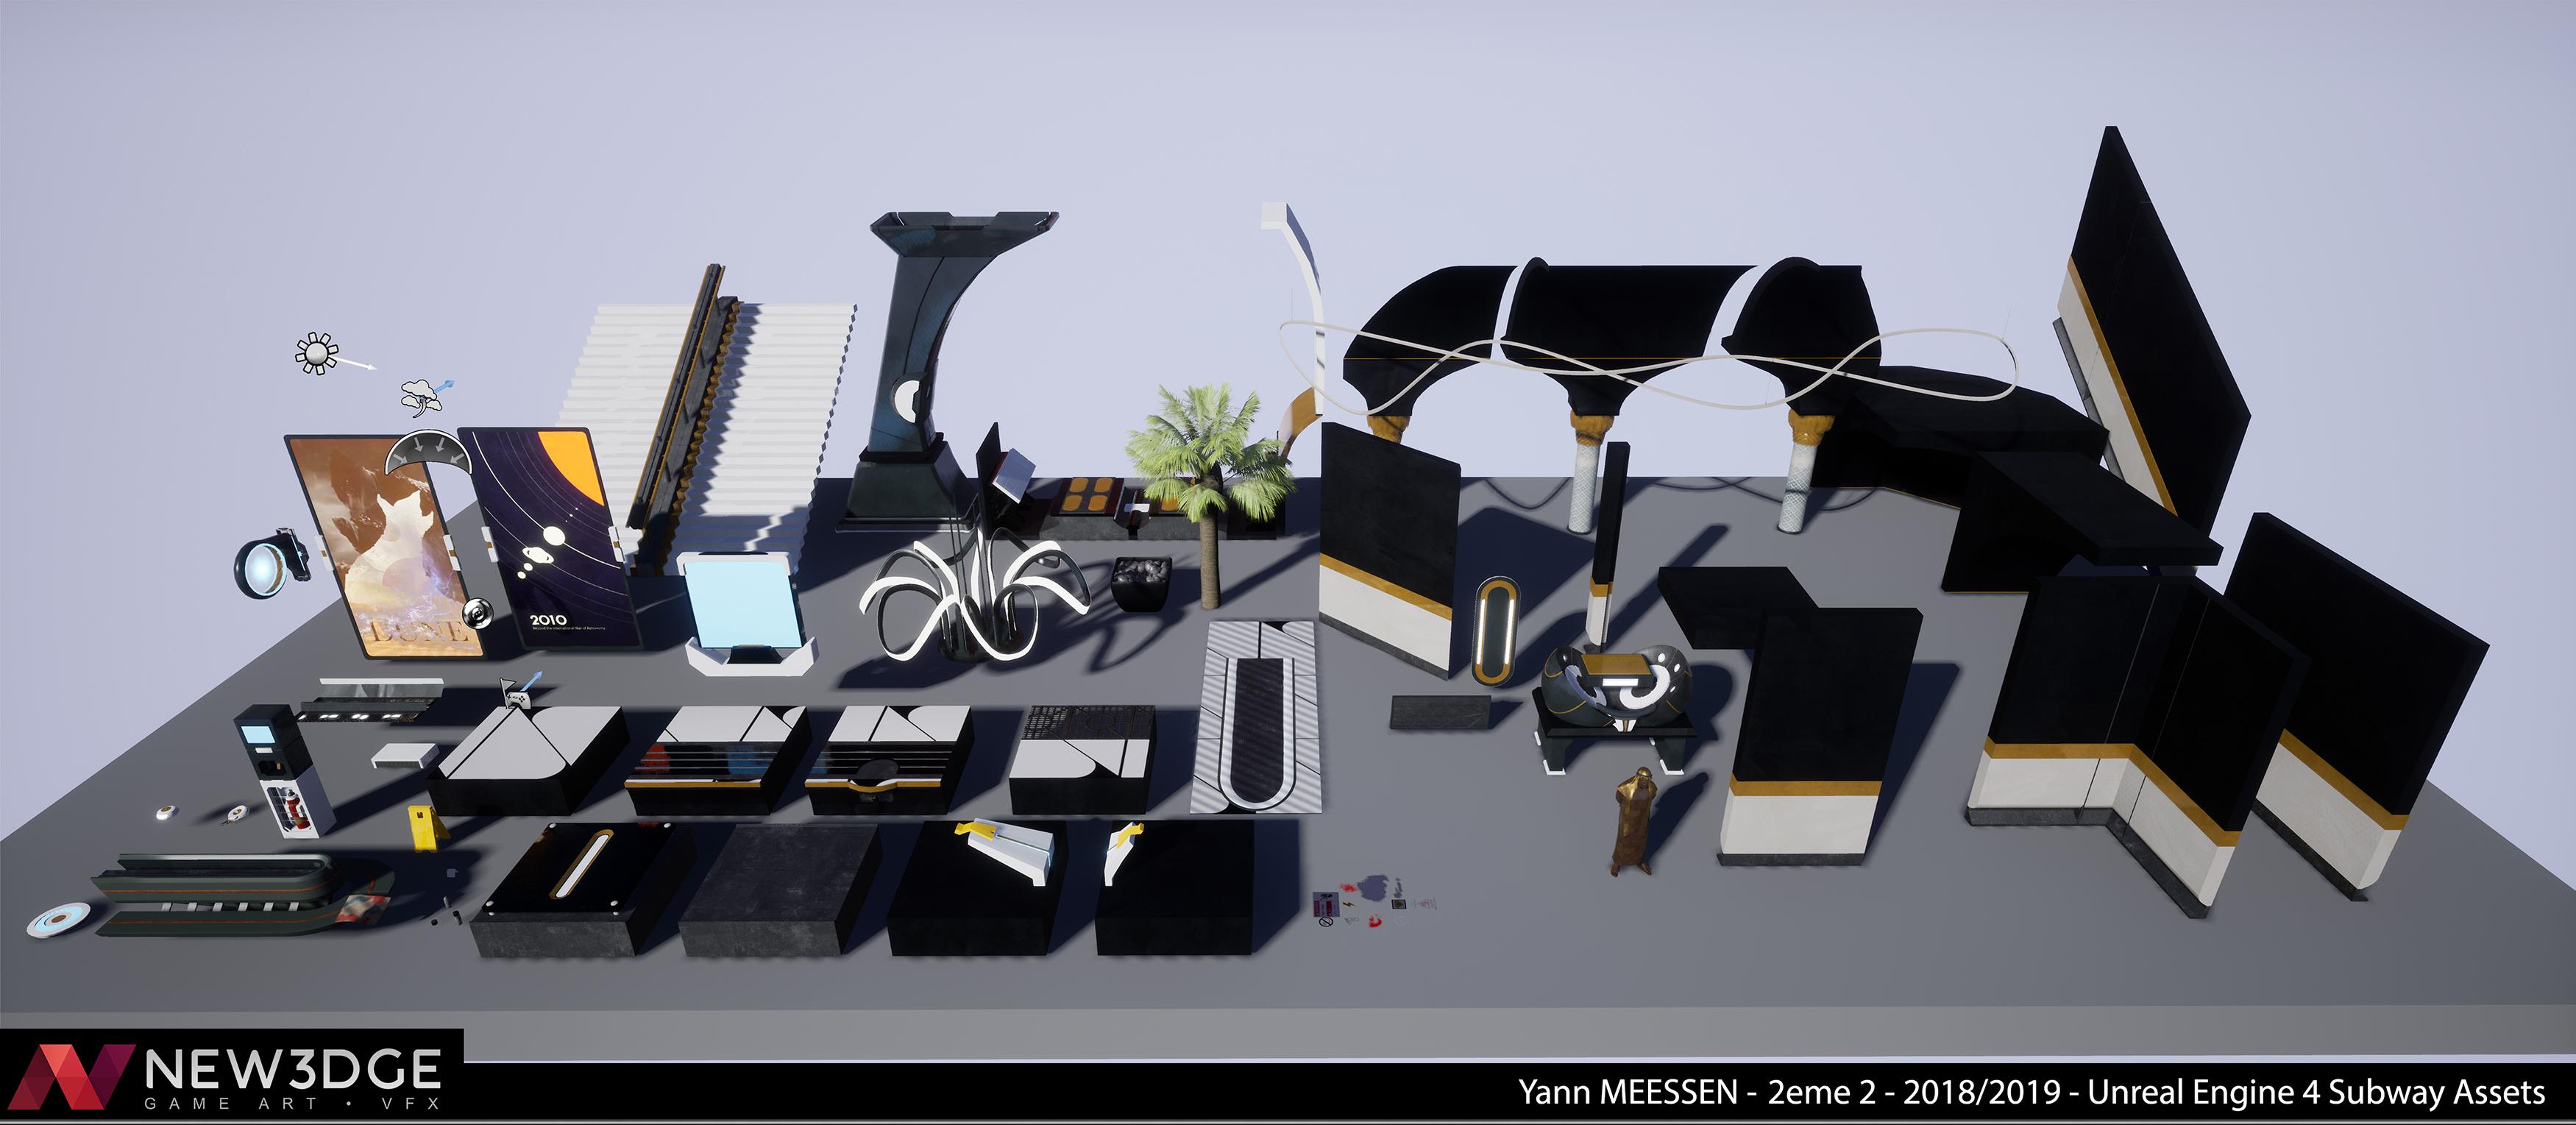 Dubai Sci-Fi Subway - Unreal Engine 4 | The Rookies